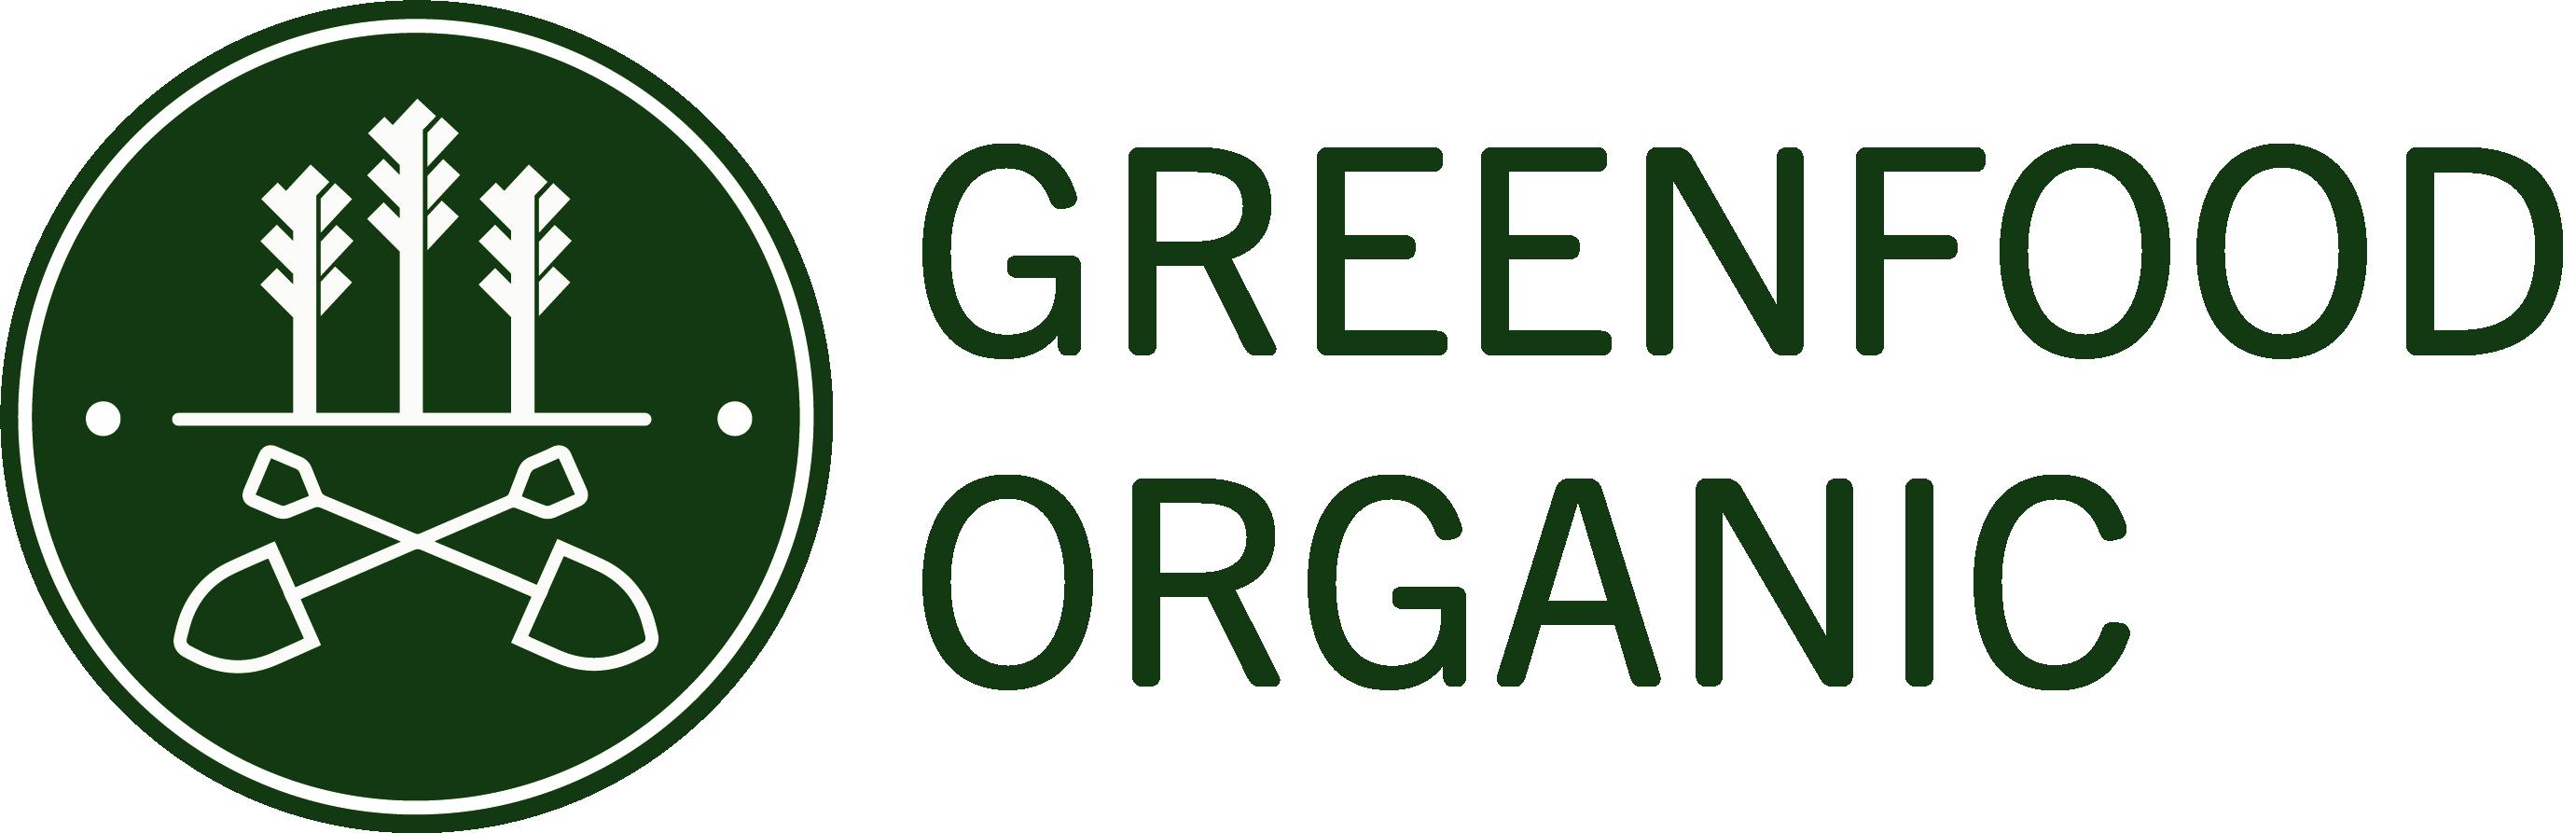 Greenfood Organic